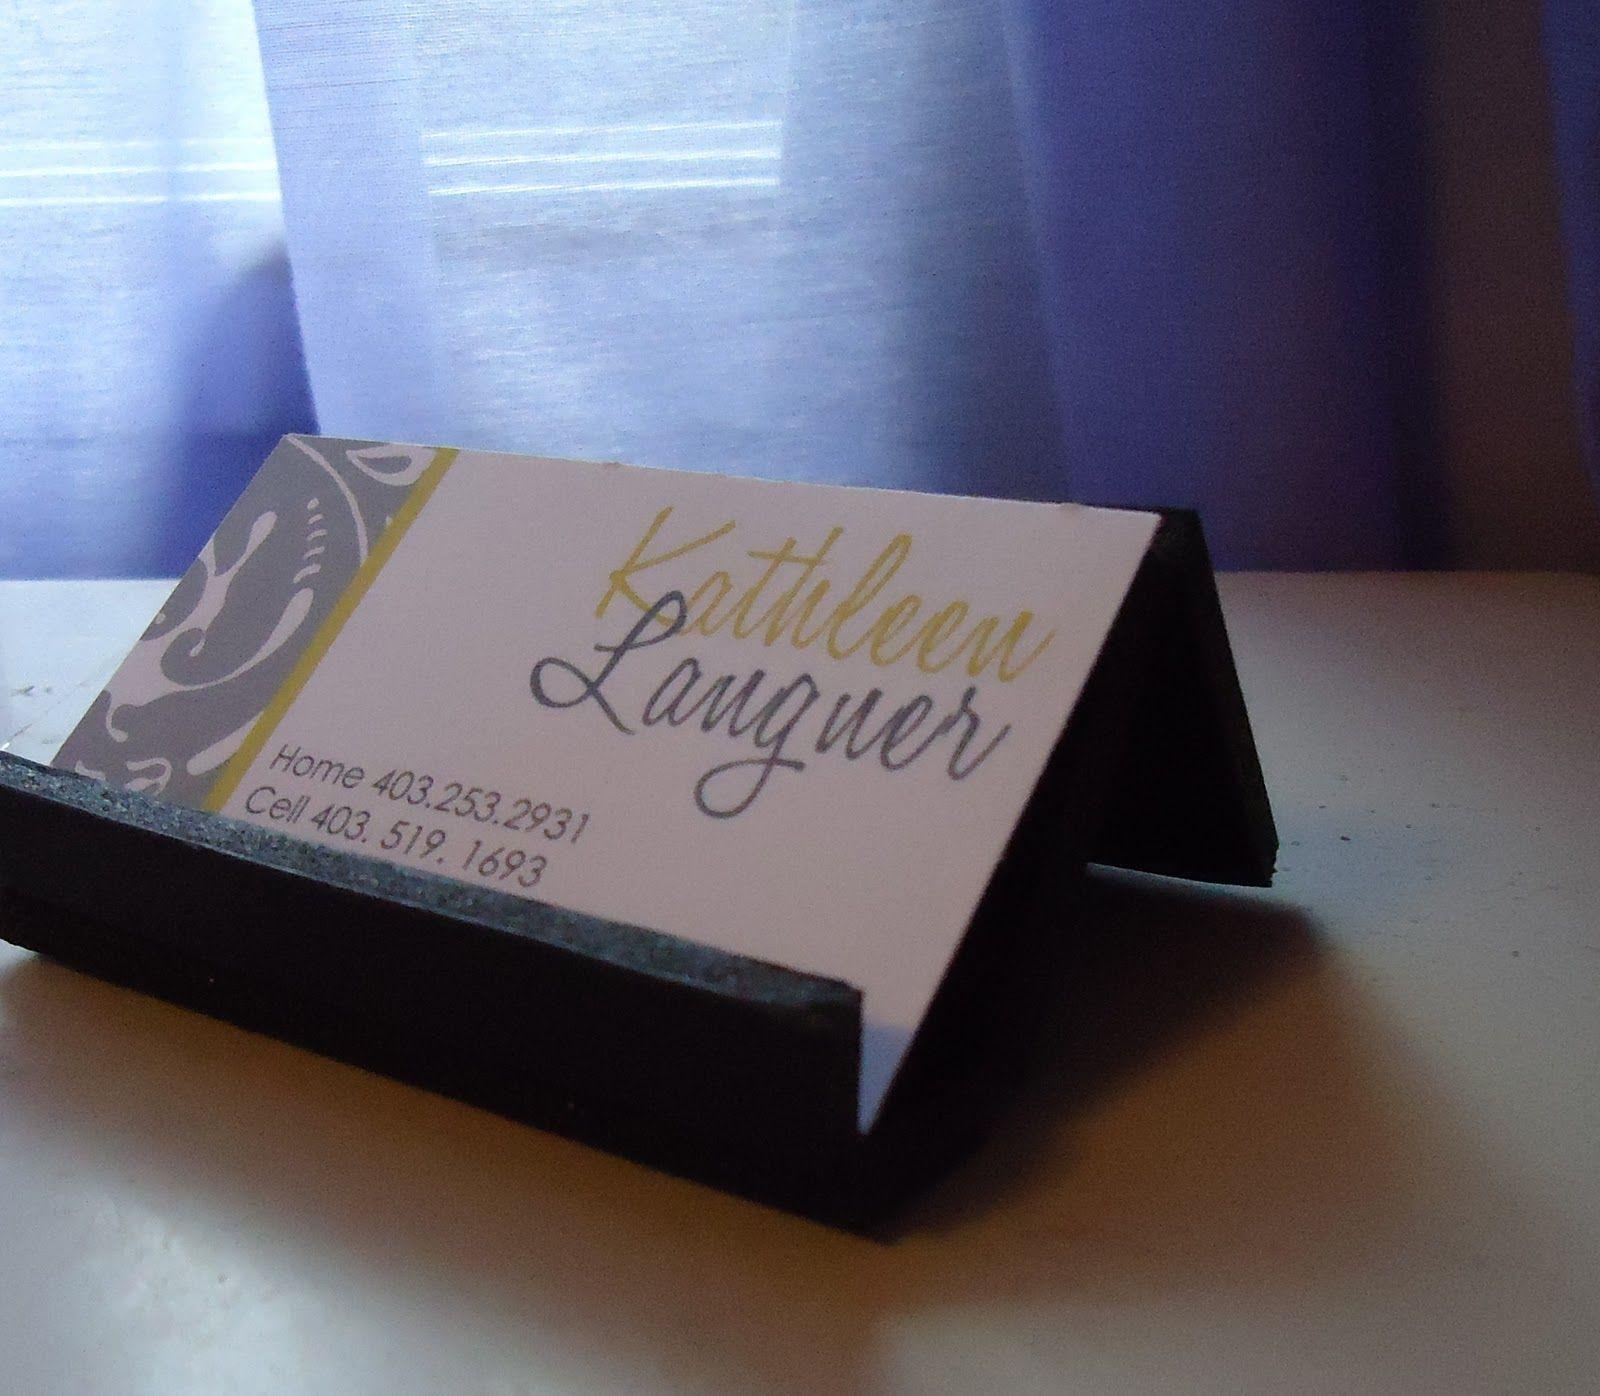 Diy Cardboard Business Card Stand Sweet Simple Diy Business Card Holder Diy Diy Business Cards Card Holder Diy Business Card Stand